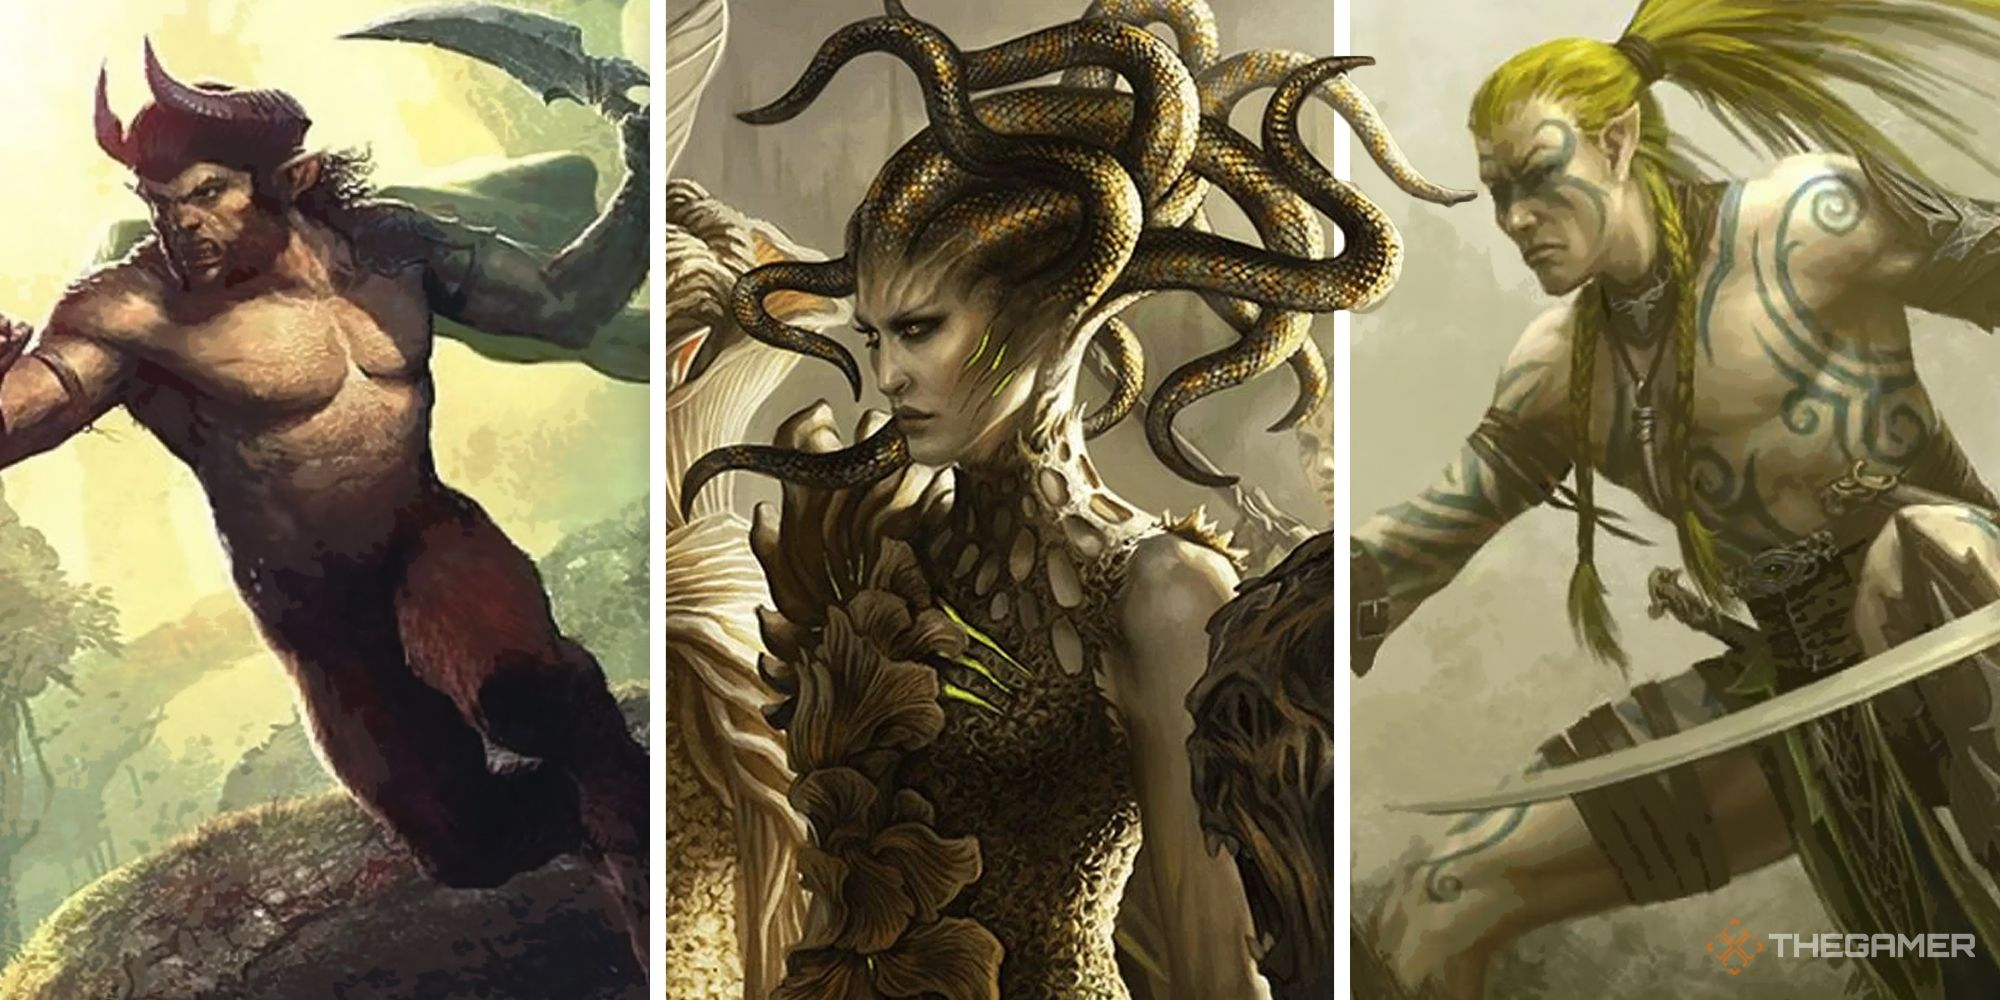 Dungeons & Dragons: todas las subclases oficiales de guardabosques, clasificadas